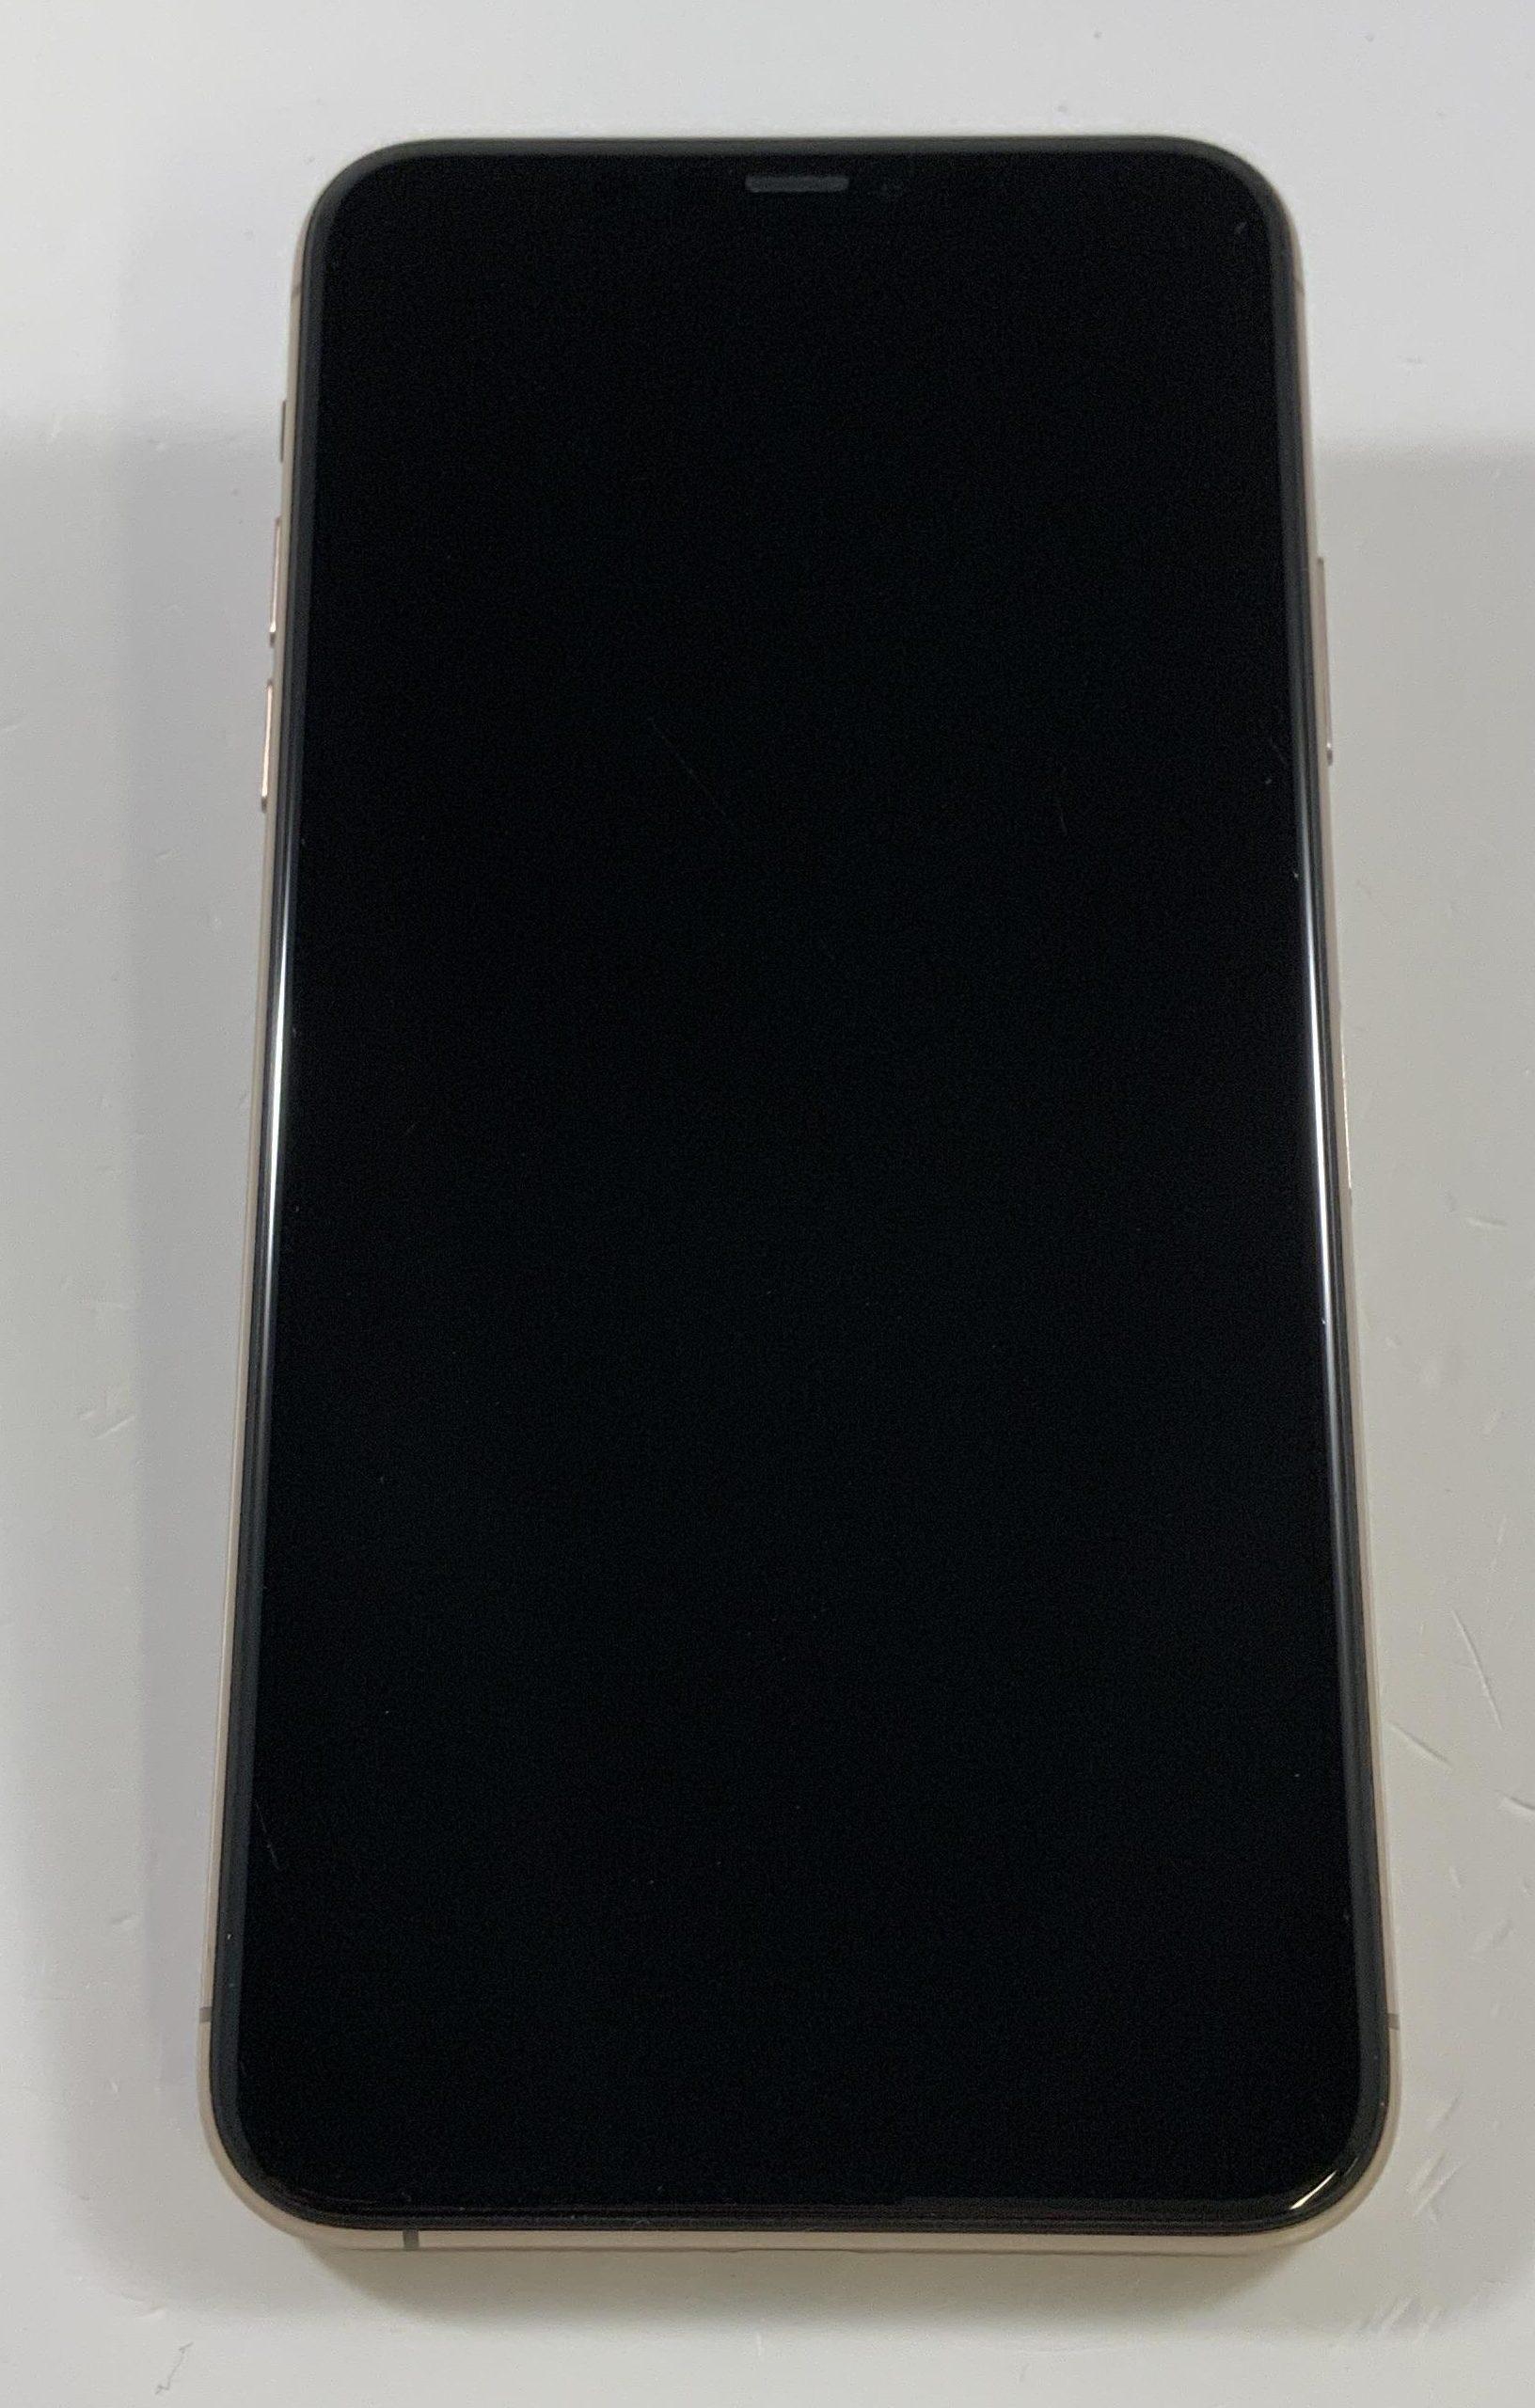 iPhone 11 Pro Max 64GB, 64GB, Gold, image 1